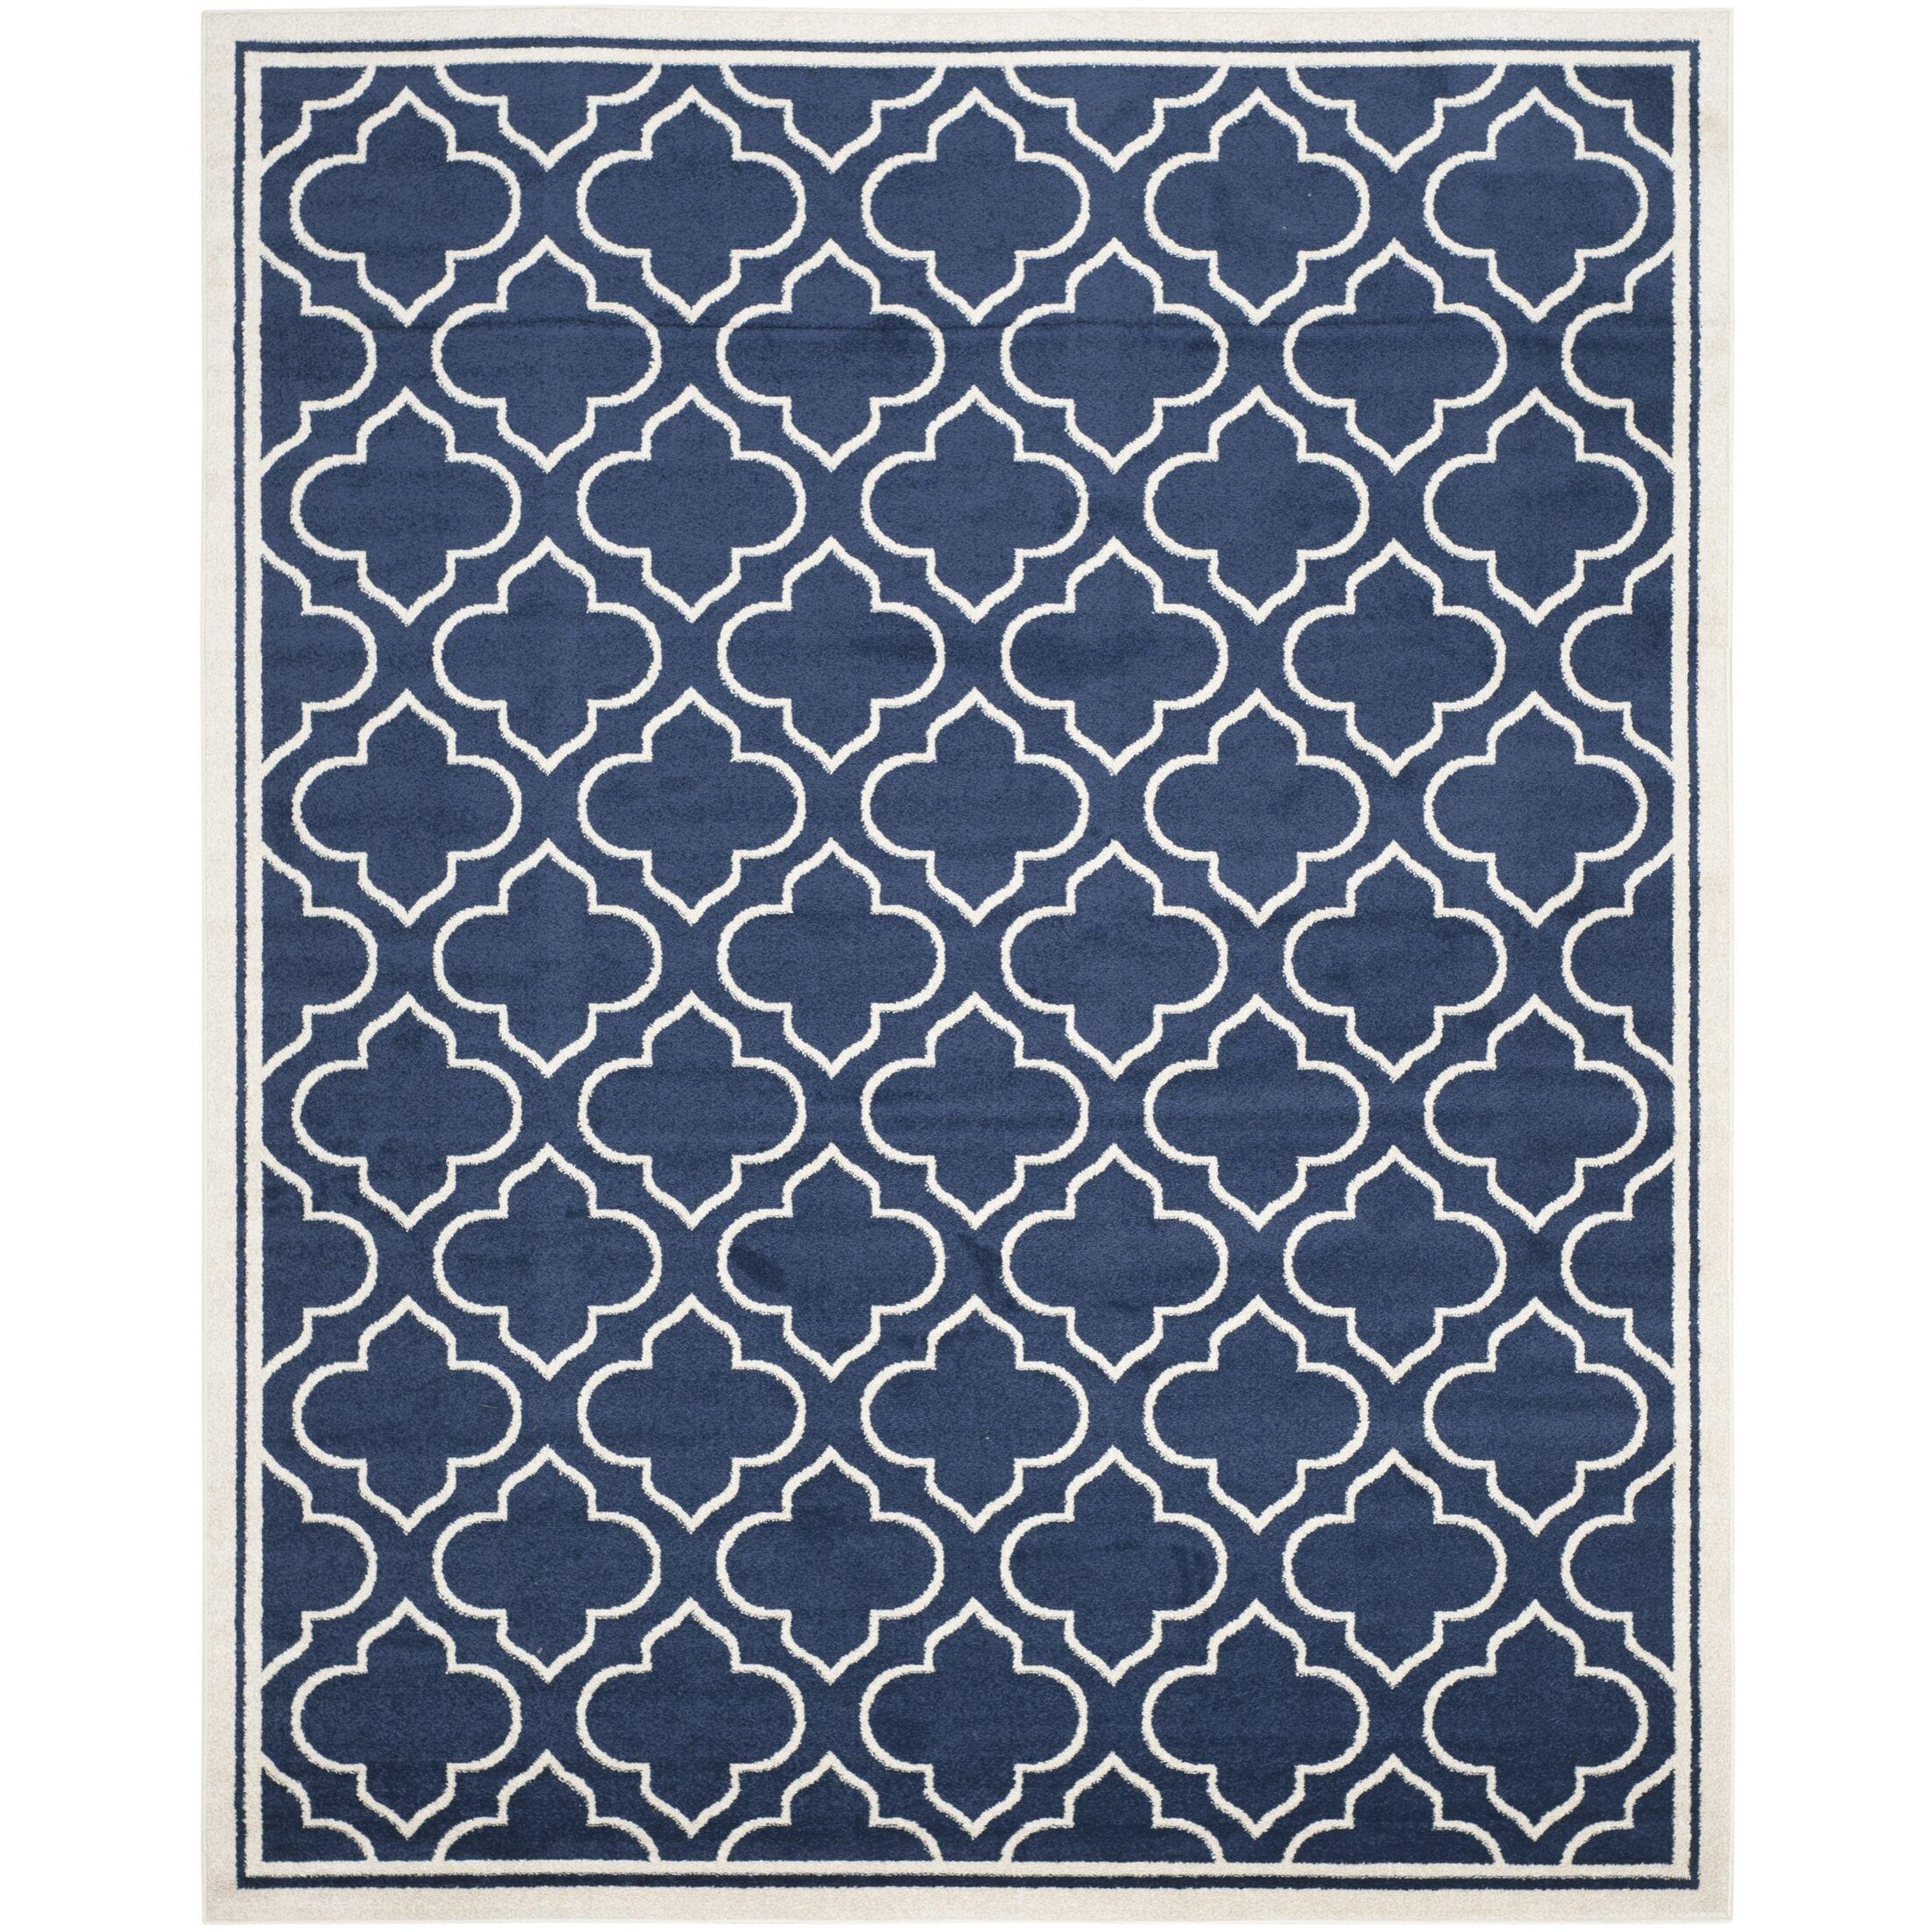 Maritza Navy / Ivory Indoor/Outdoor Area Rug Rug Size: Rectangle 8' x 10'